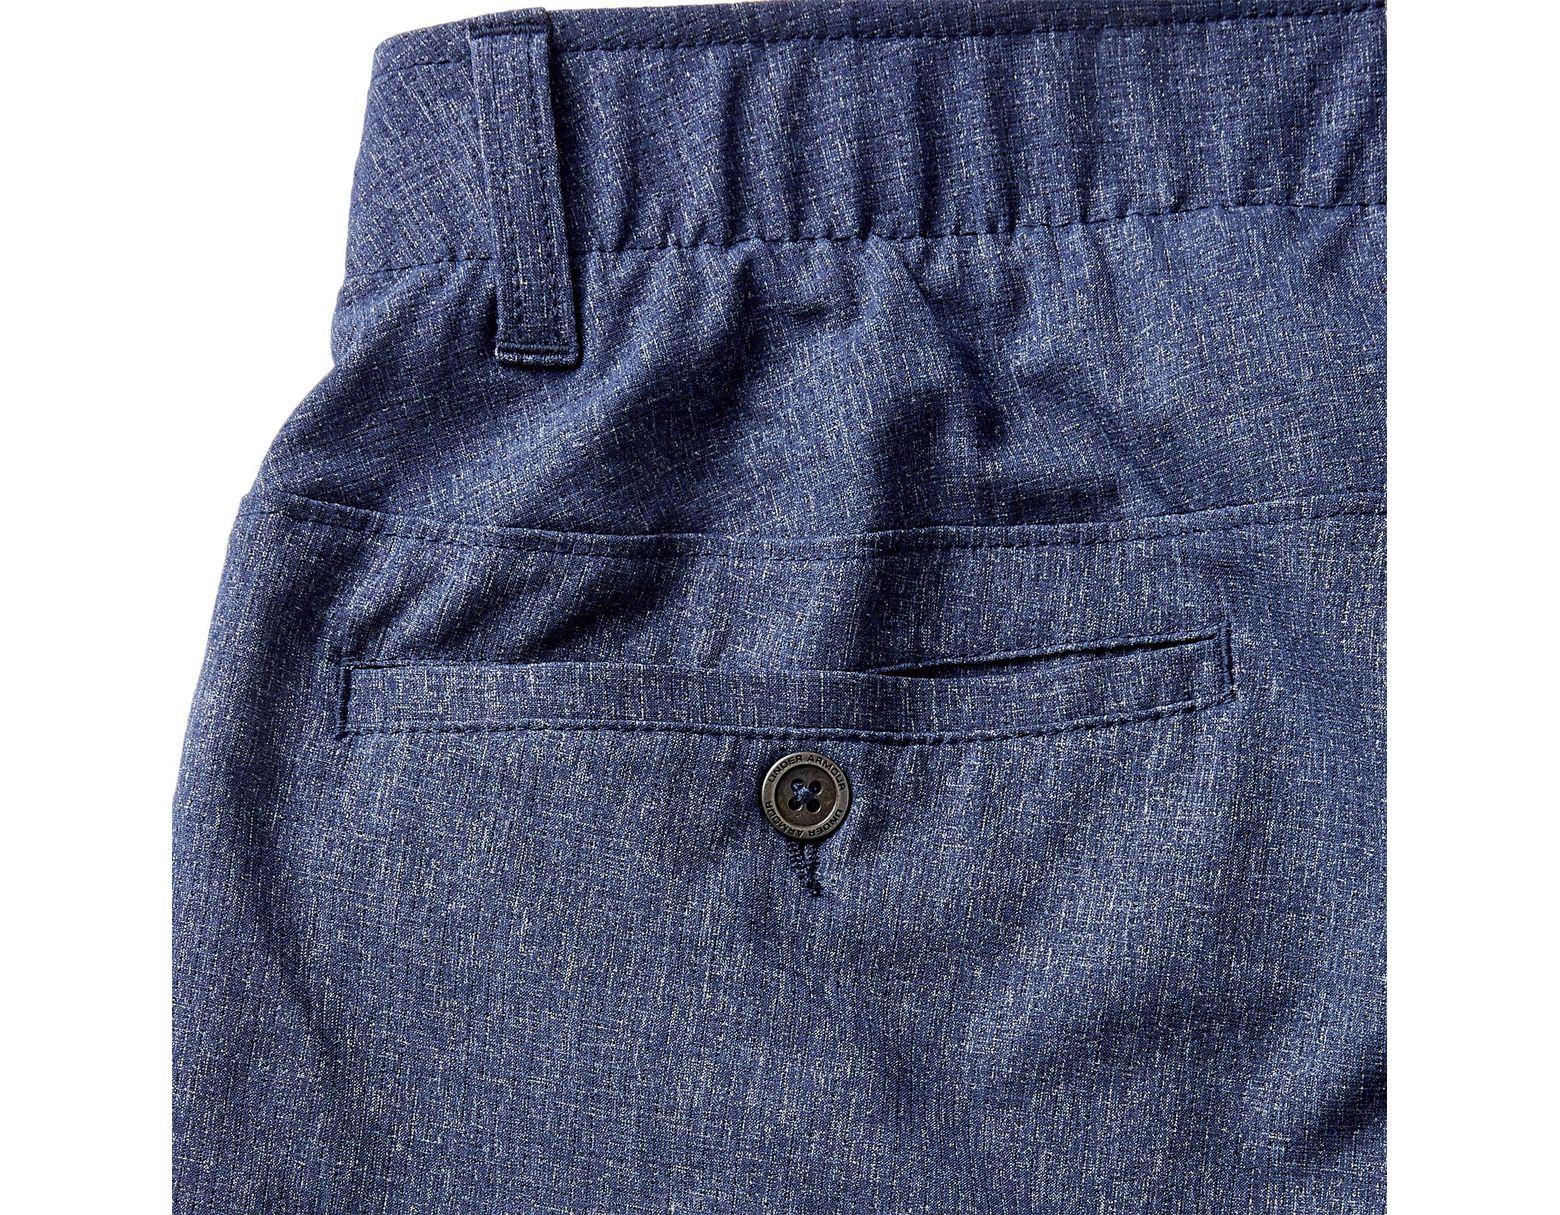 0da5f9047 Under Armour Showdown Vented Golf Pants in Blue for Men - Lyst